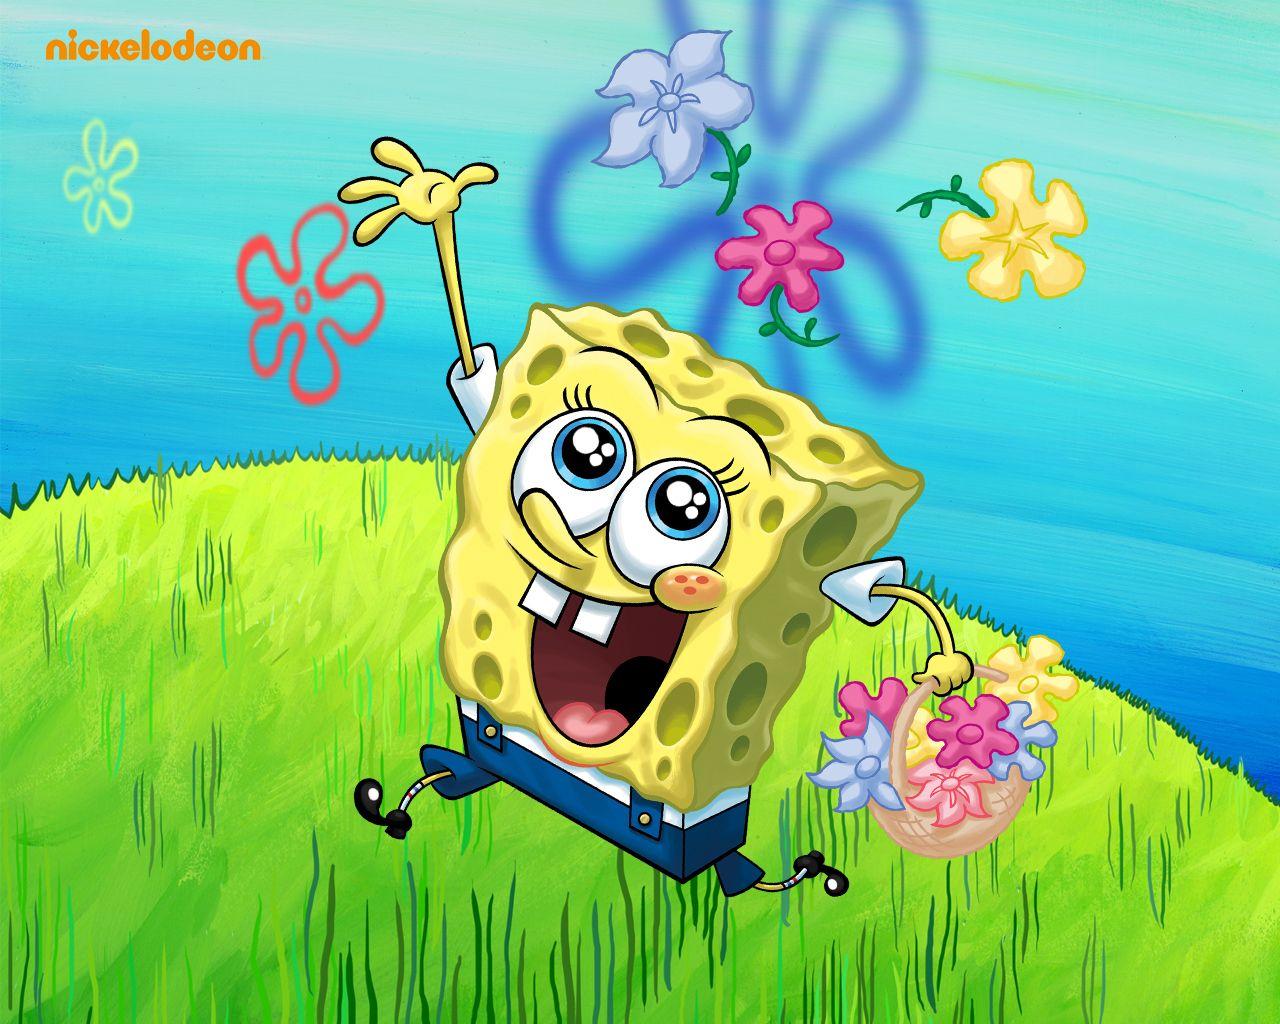 spongebob+images Spongebob Spongebob Squarepants